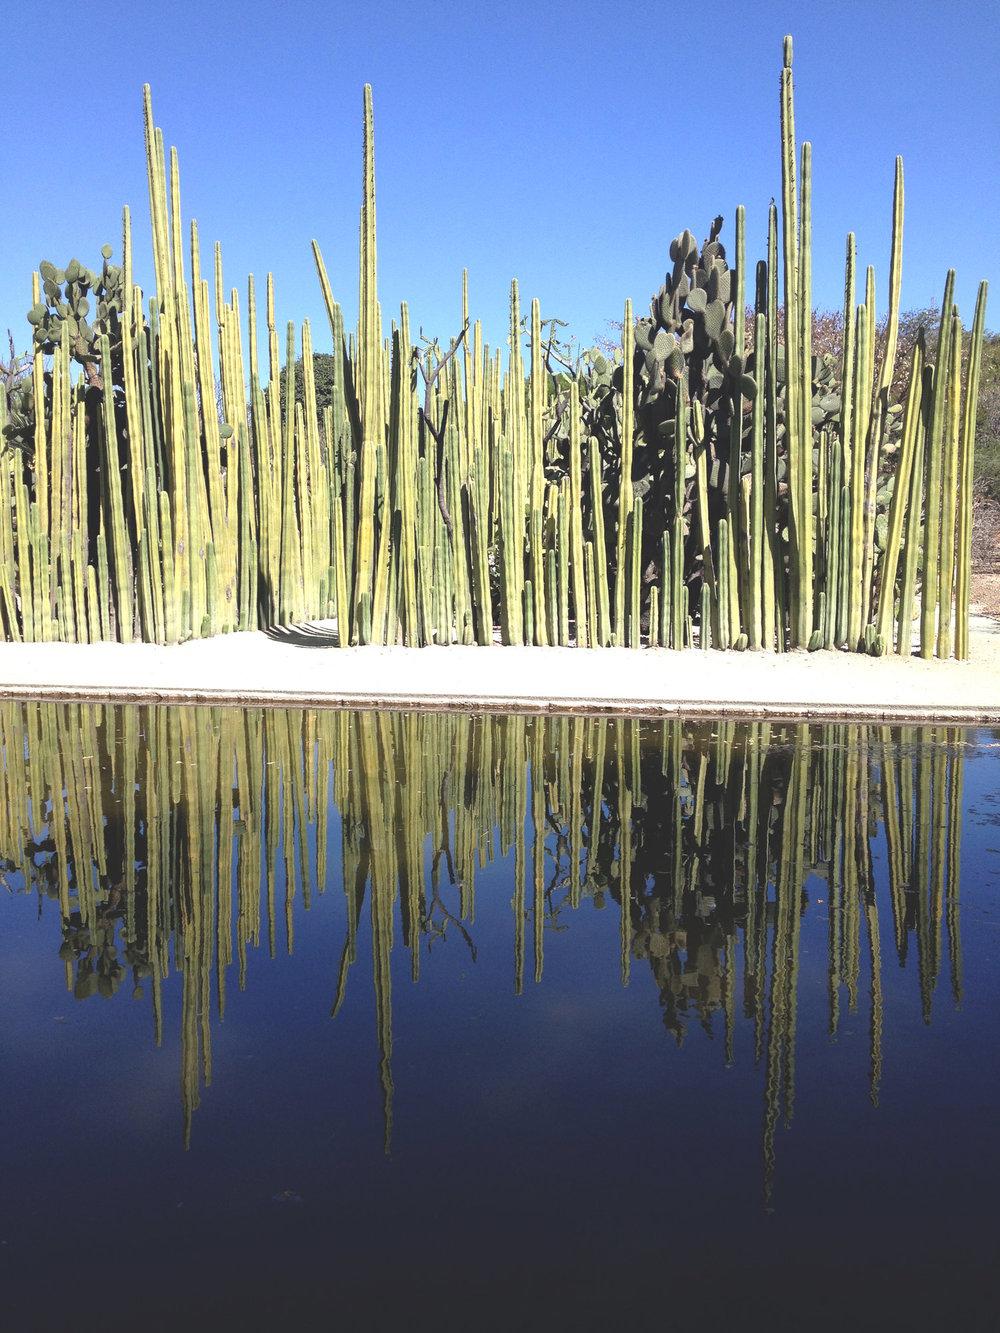 Rebecca+Mir+Grady+Jardin+Etnobotanico+Oaxaca.jpeg